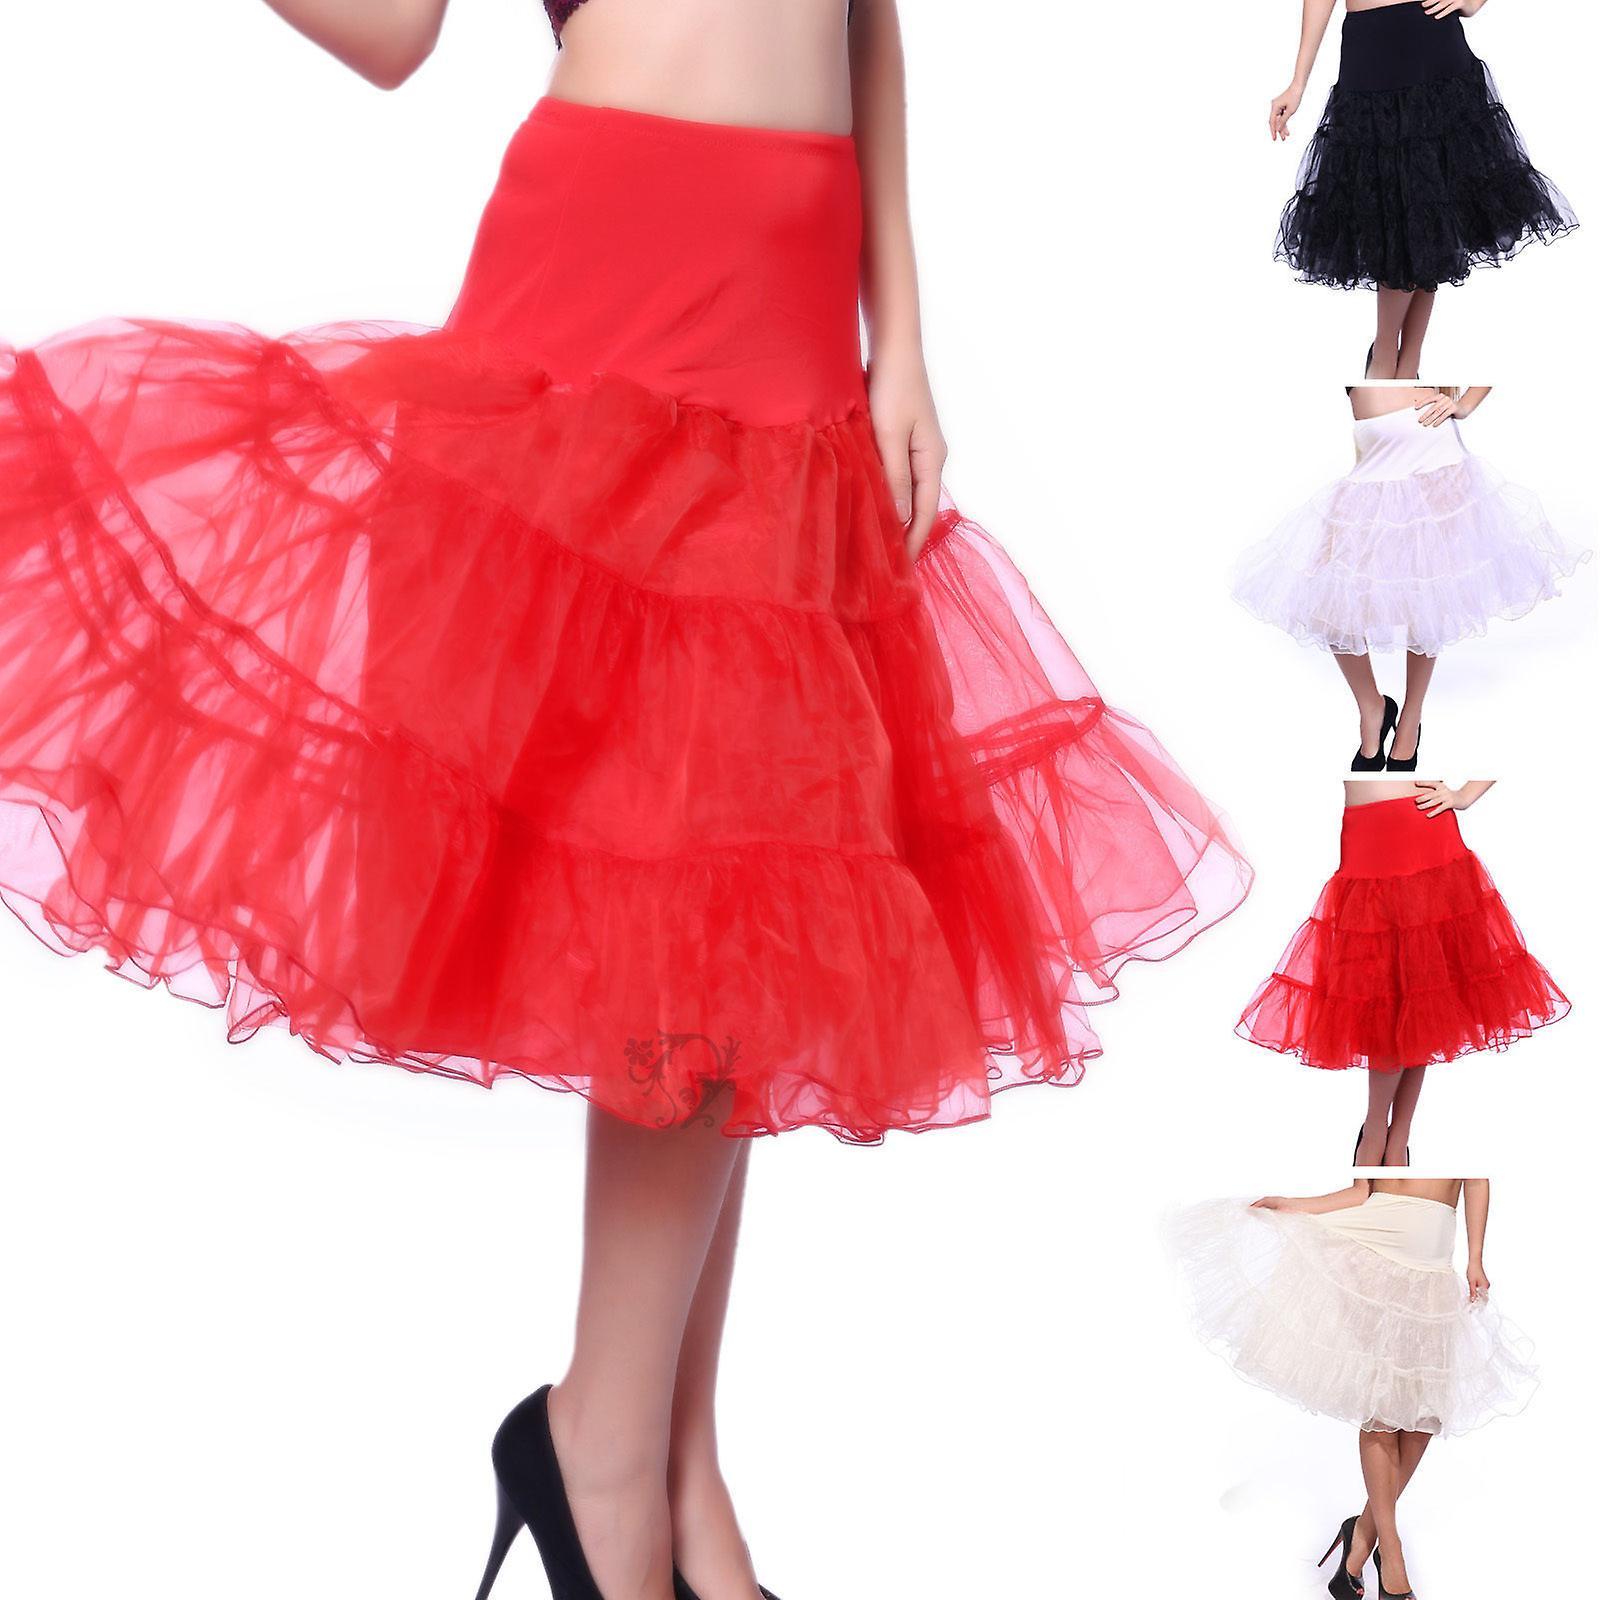 7ded9ac99245 27-tums retro underkjol 50s Swing Vintage underkjol Rockabilly Tutu Fancy  netto kjol